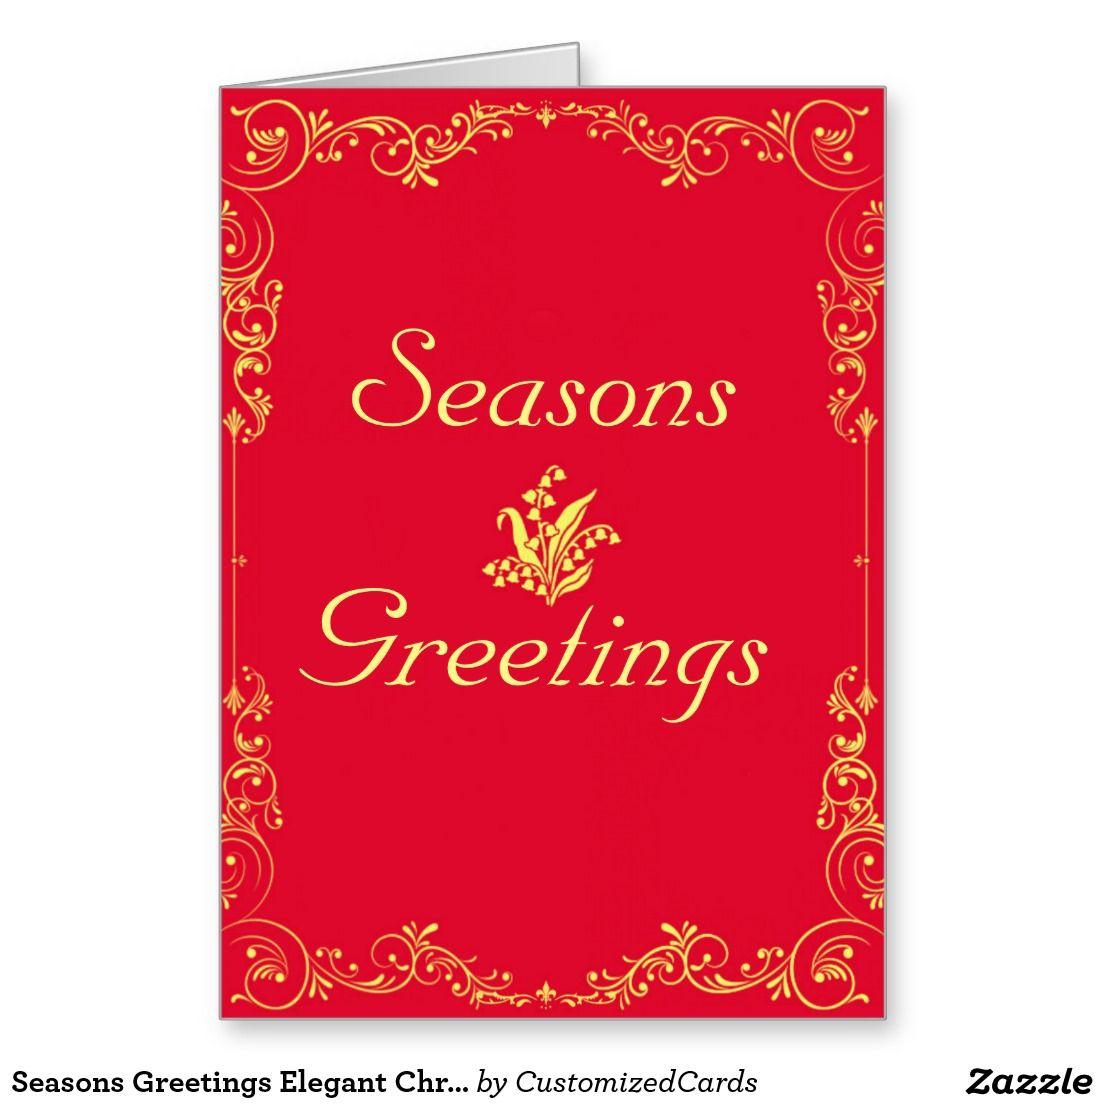 Seasons Greetings Elegant Christmas Red And Yellow Holiday Card